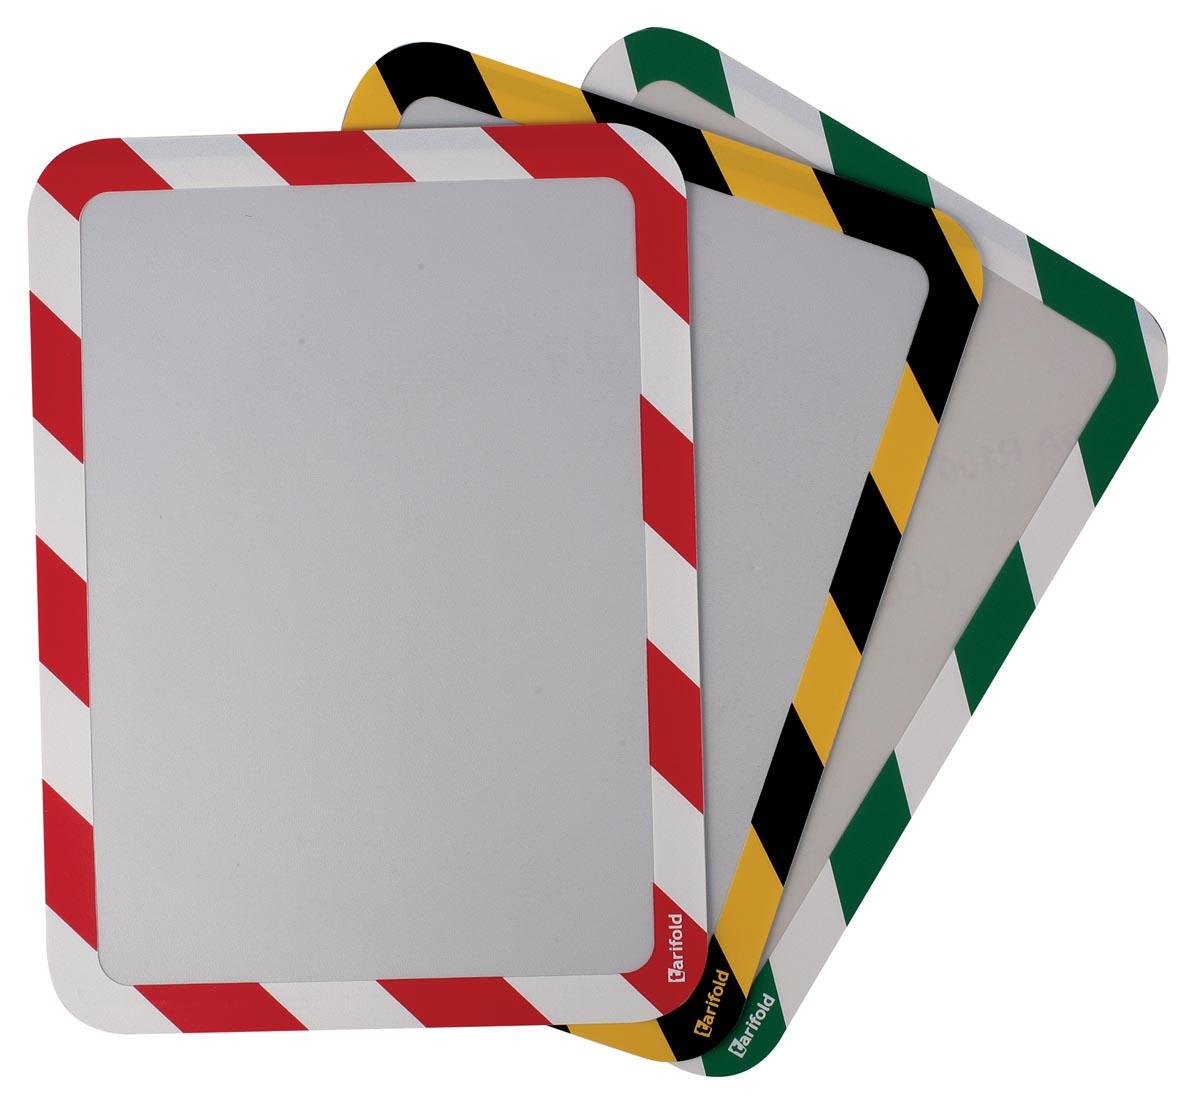 Tarifold zelfklevende tas, ft A4, rood/wit, pak van 2 stuks